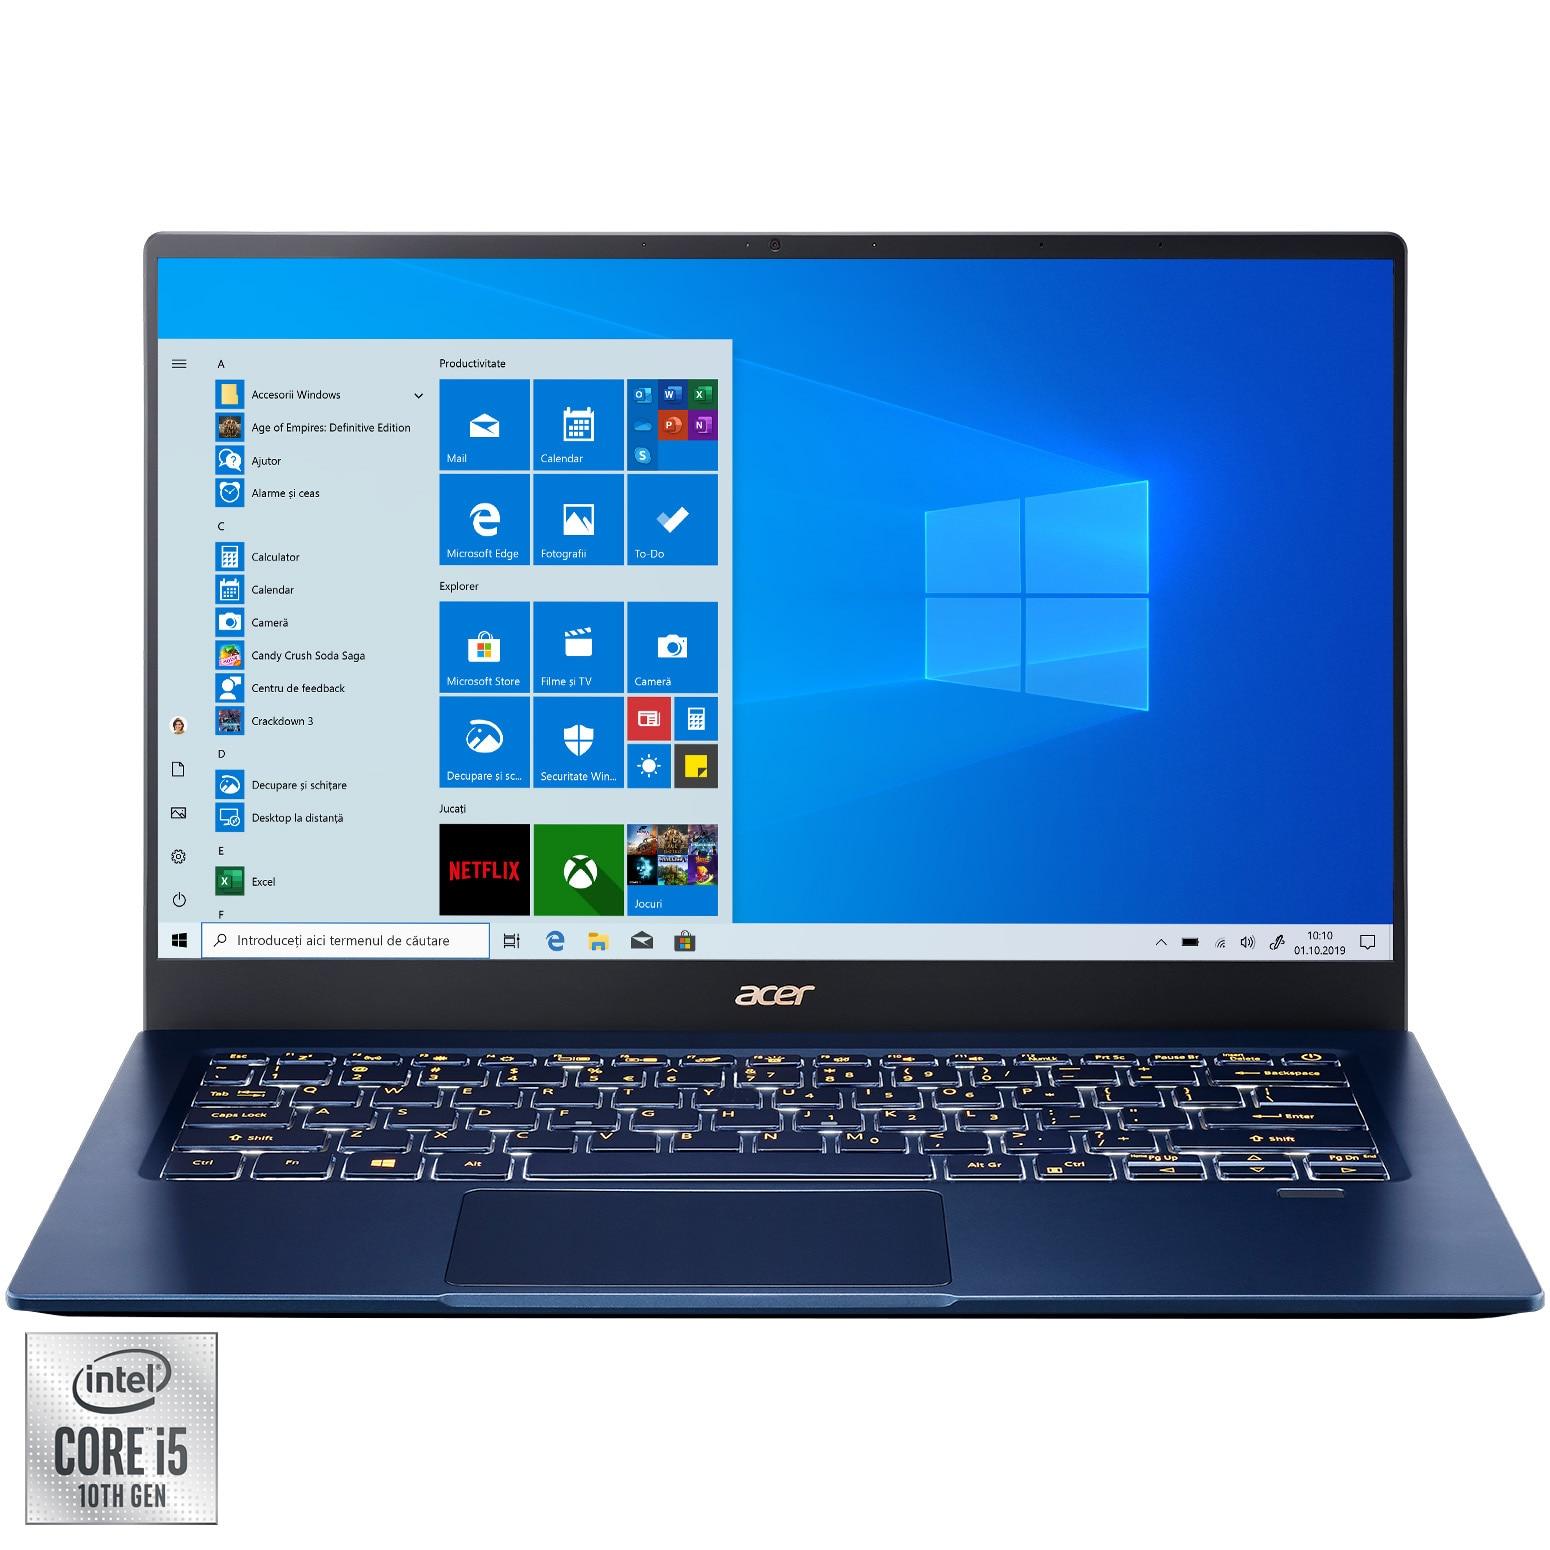 "Fotografie Laptop ultraportabil Acer Swift 5 SF514-54 cu procesor Intel® Core™ i5-1035G1 pana la 3.60 GHz, 14"", Full HD, Touch, 8GB, 256GB SSD, NVIDIA® GeForce® MX350 2GB, Windows 10 Pro, Blue"